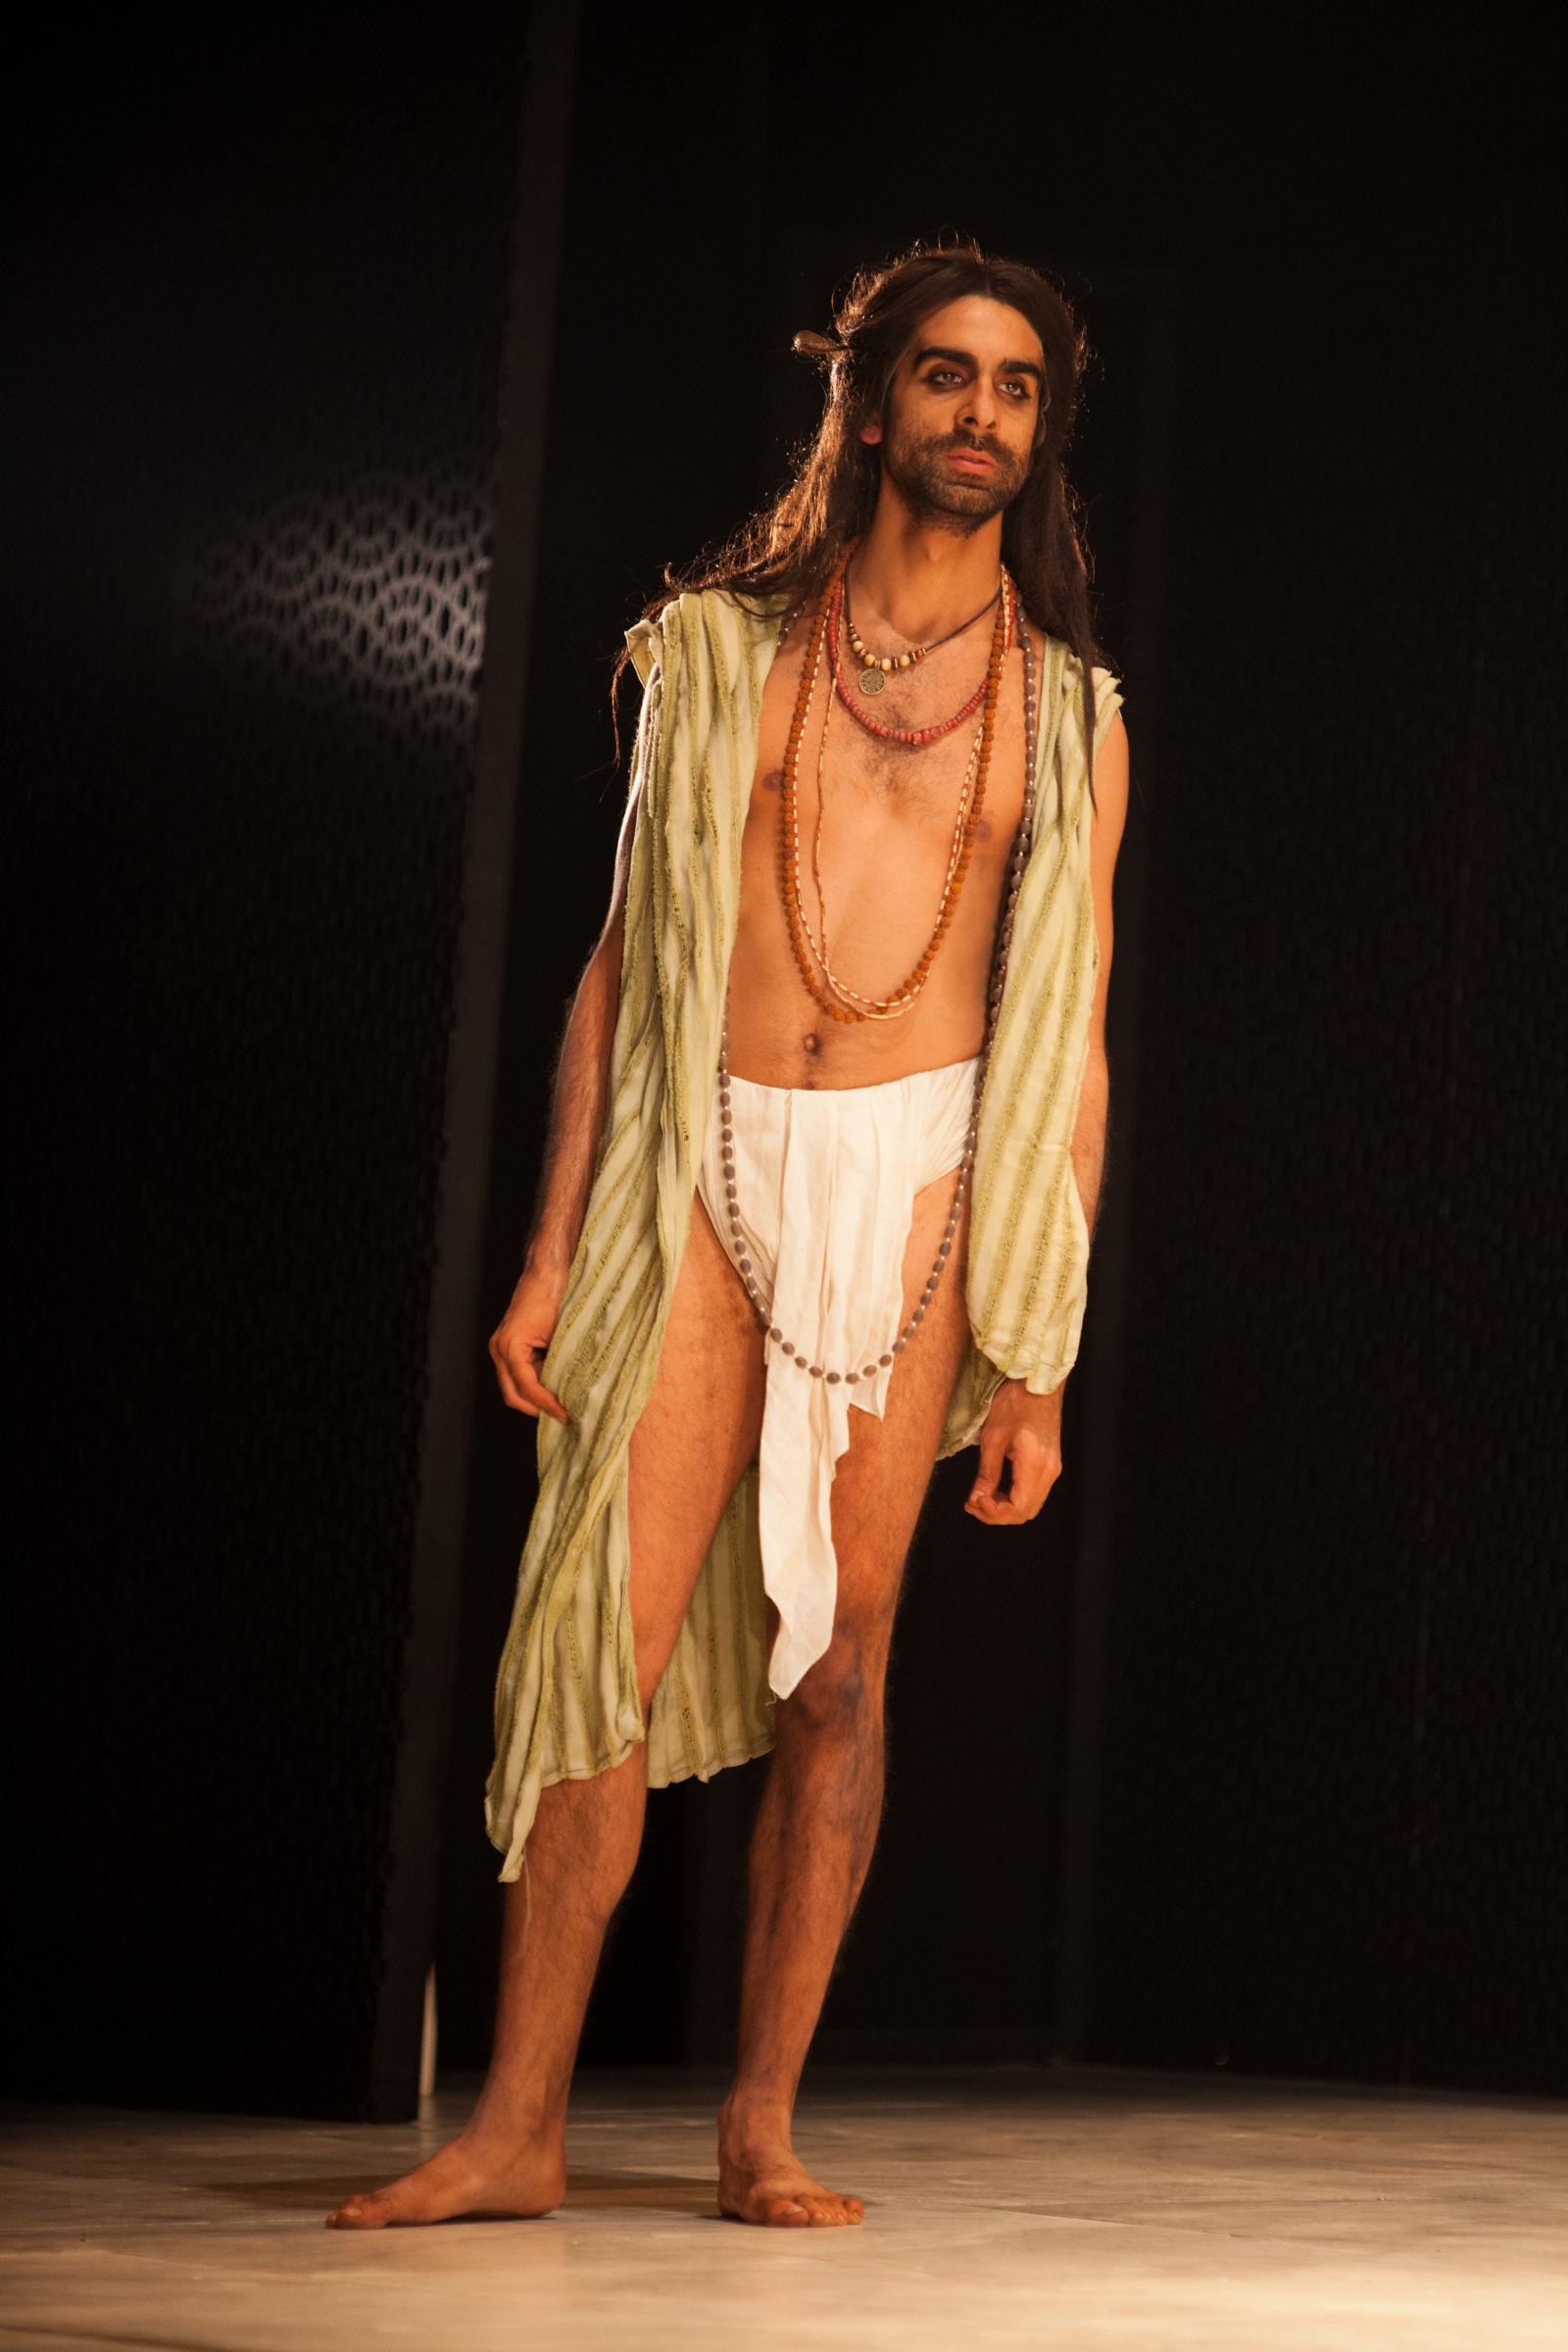 Scott Karim as Faqir by Ellie Kurttz